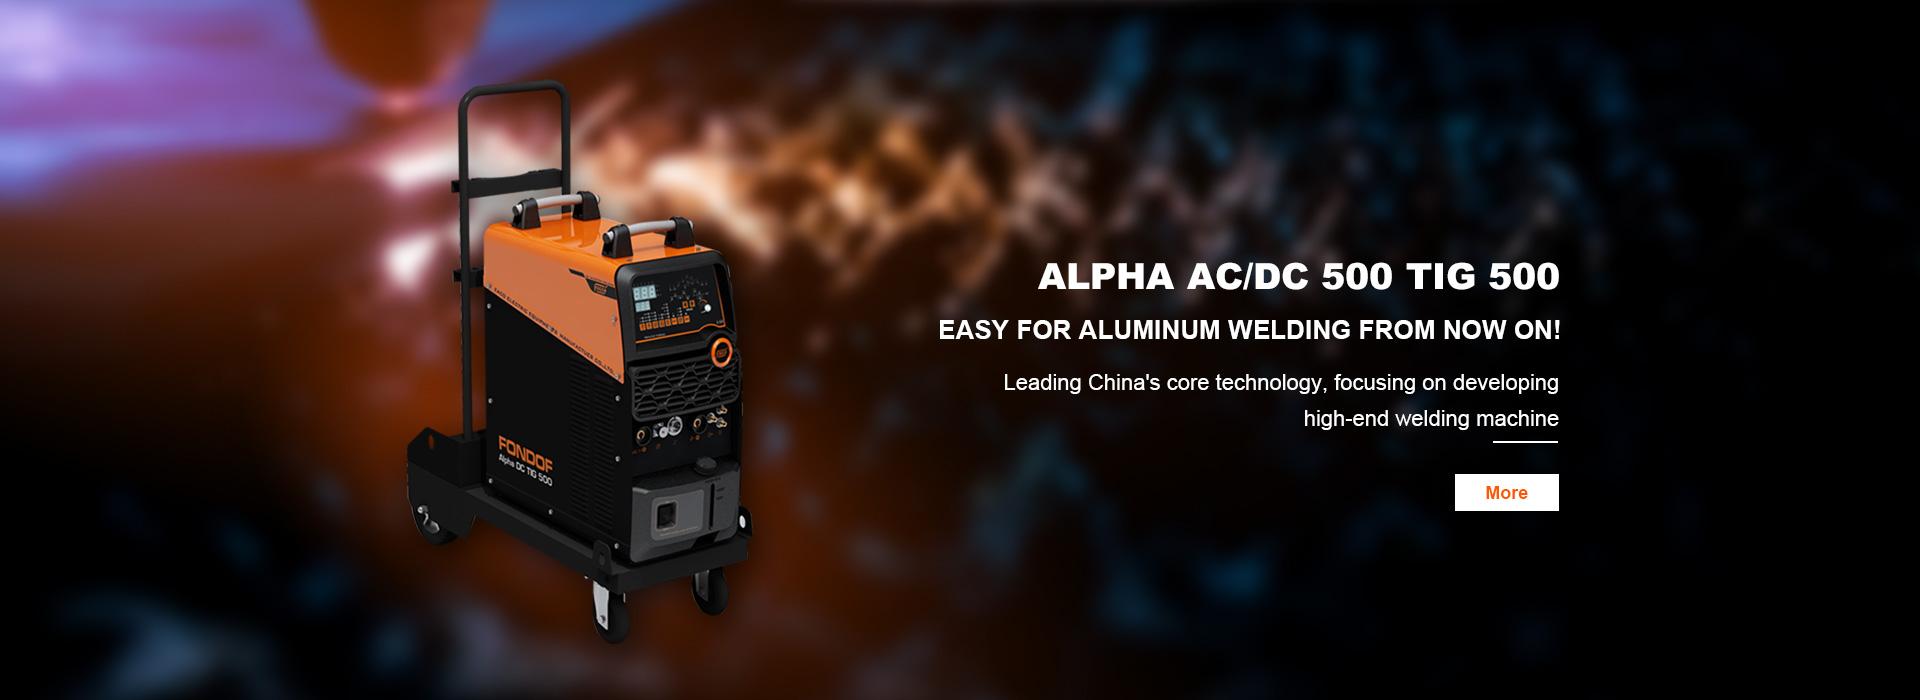 AC DC Pulse TIG Welding Machines  Alpha AC\\DC TIG 500